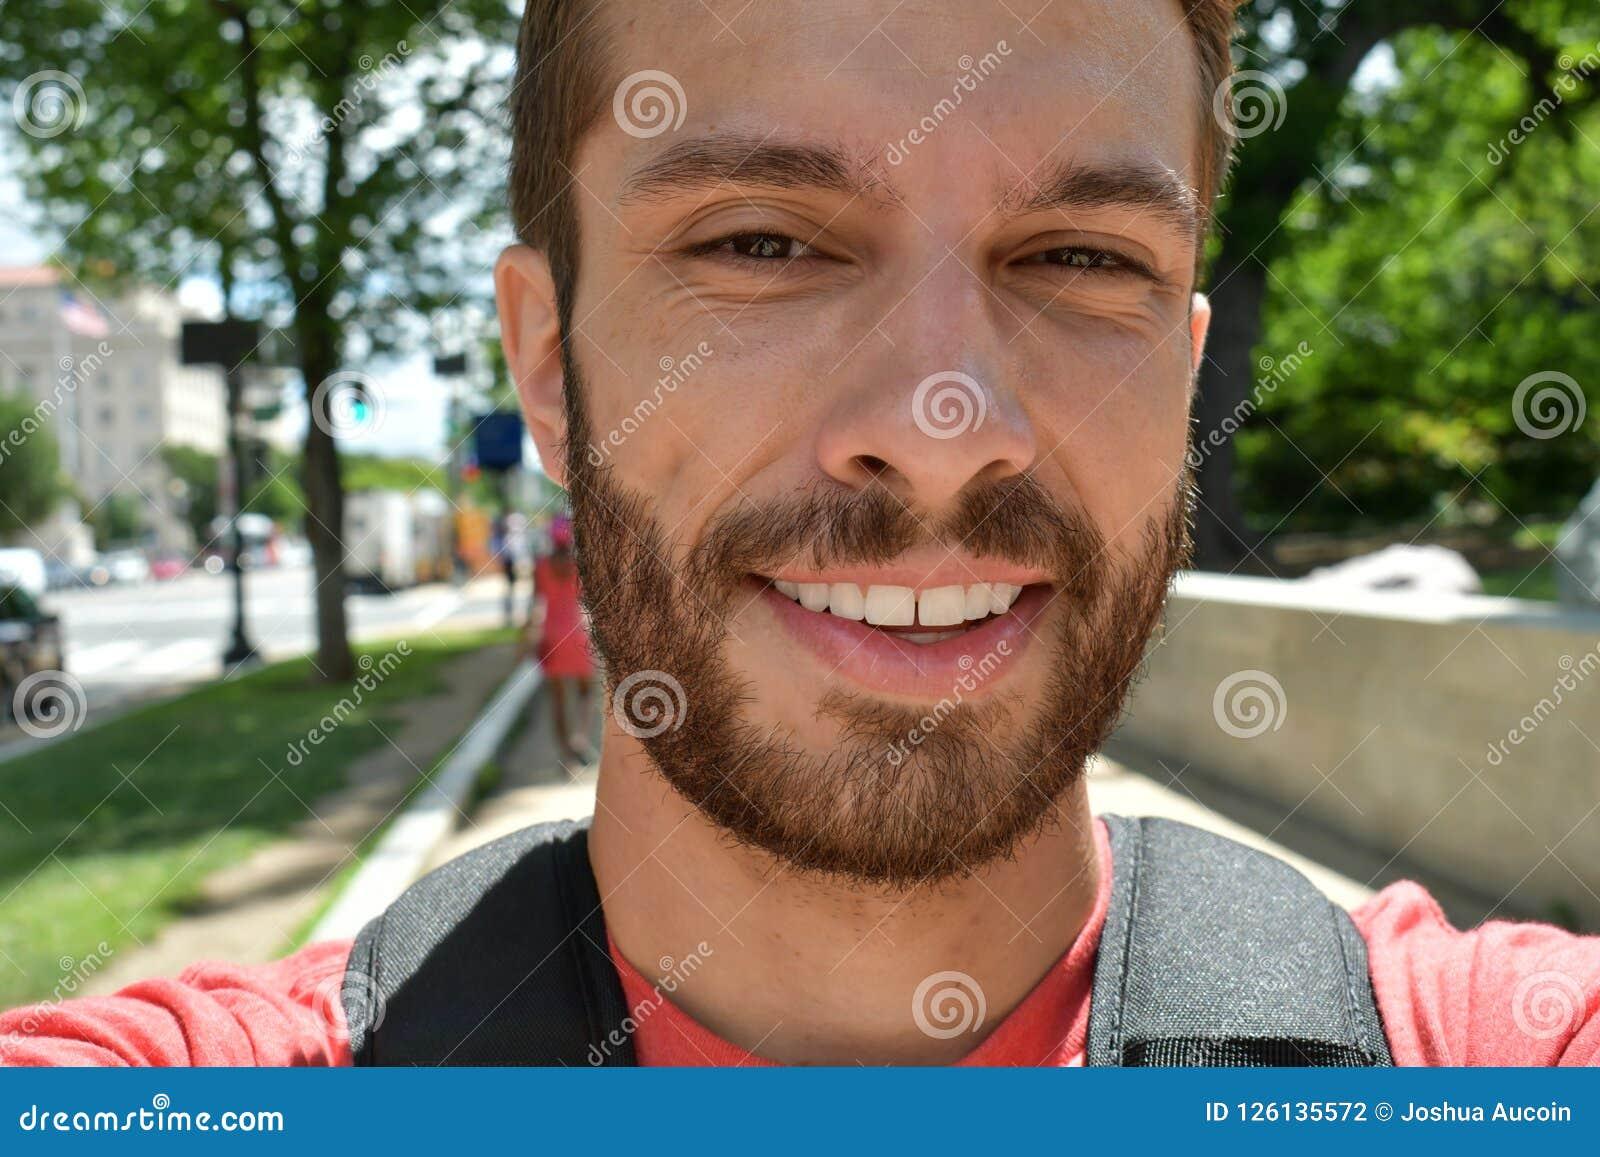 Tourist takes a selfie while walking